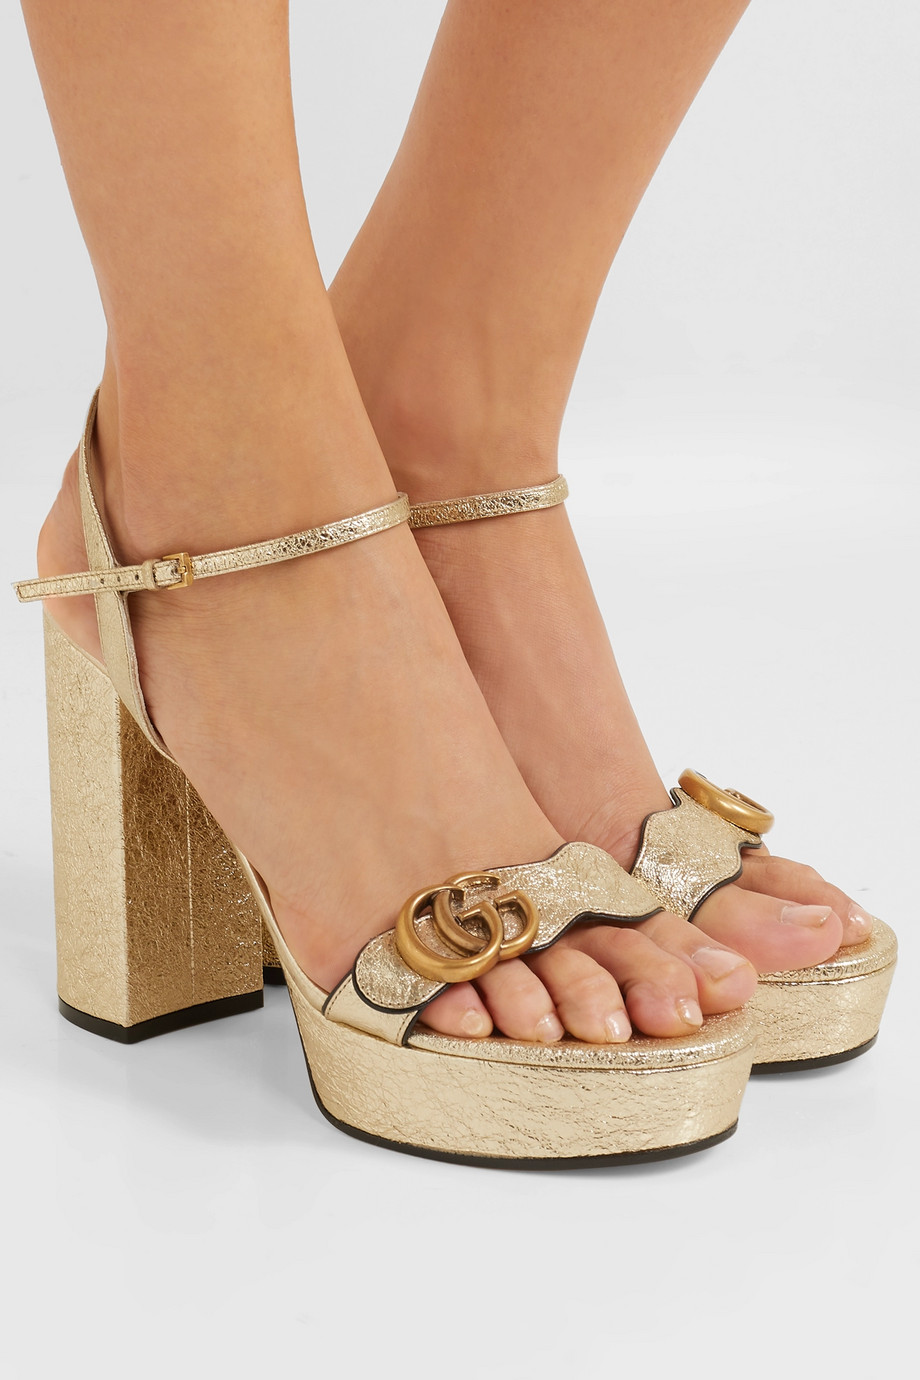 Gucci Marmont logo-embellished metallic cracked-leather platform sandals